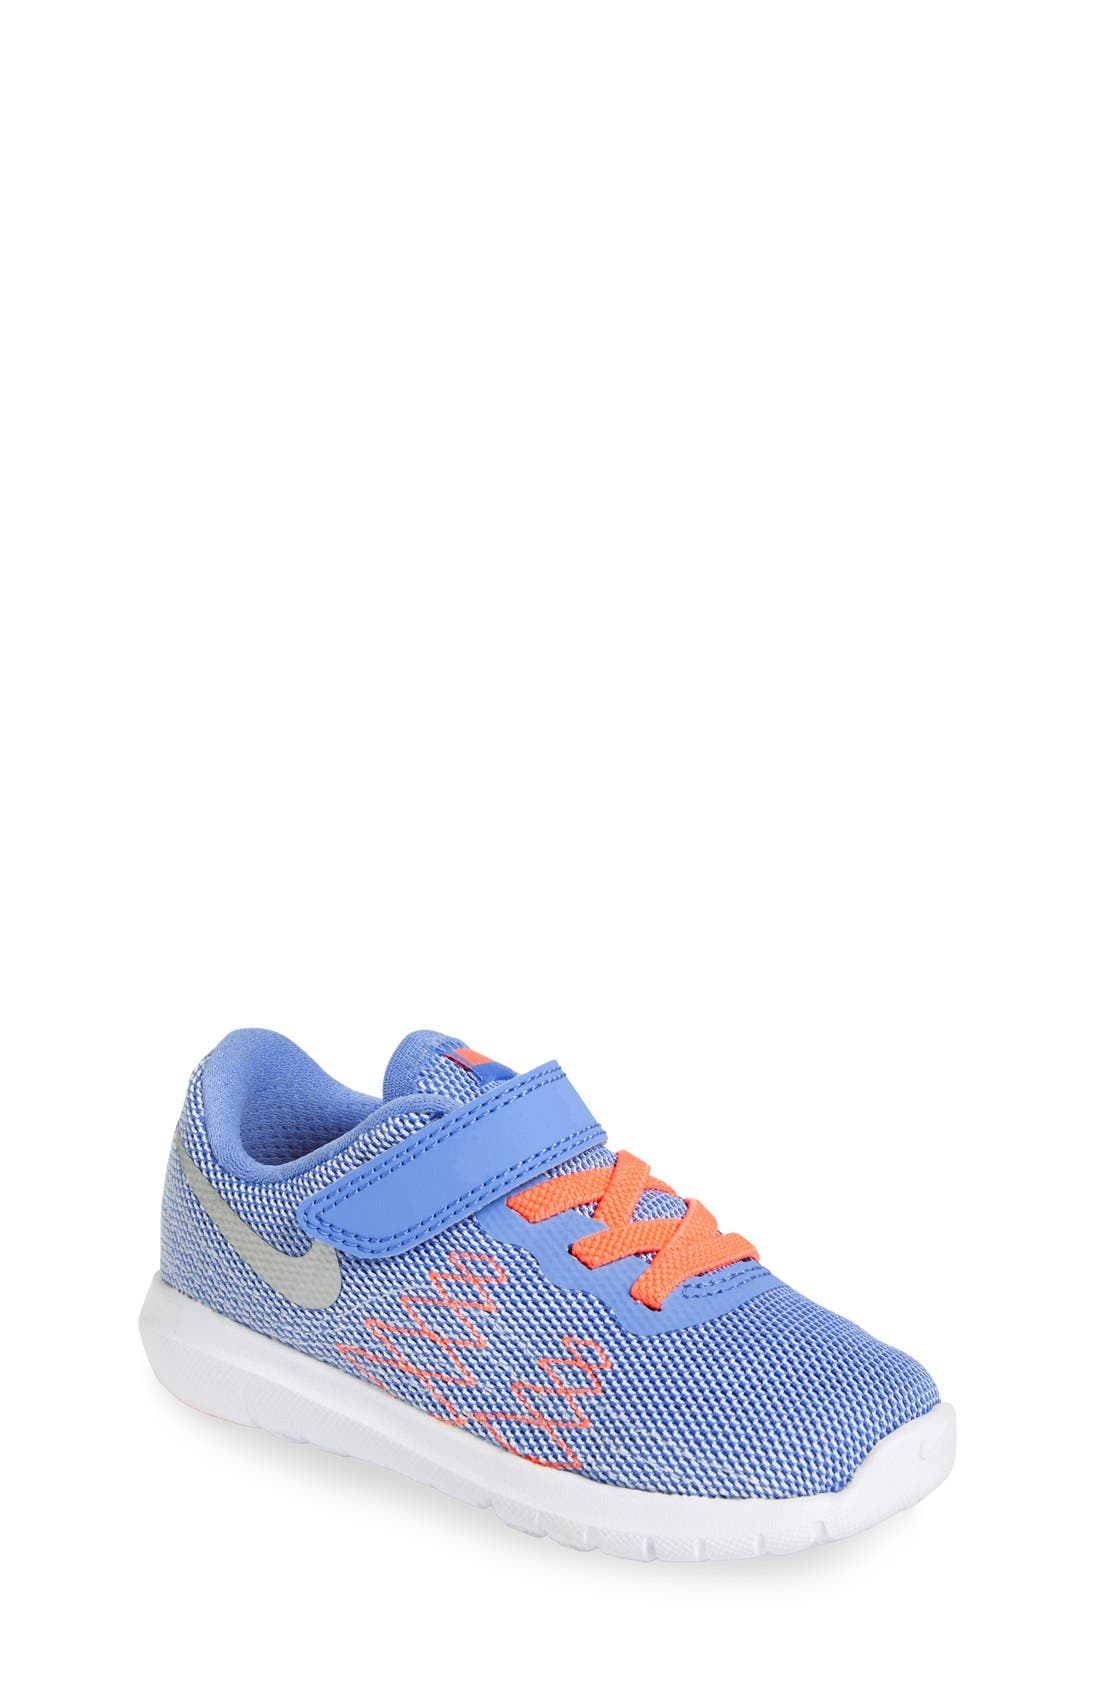 Main Image - Nike Flex Fury 2 Athletic Shoe (Baby, Walker & Toddler)